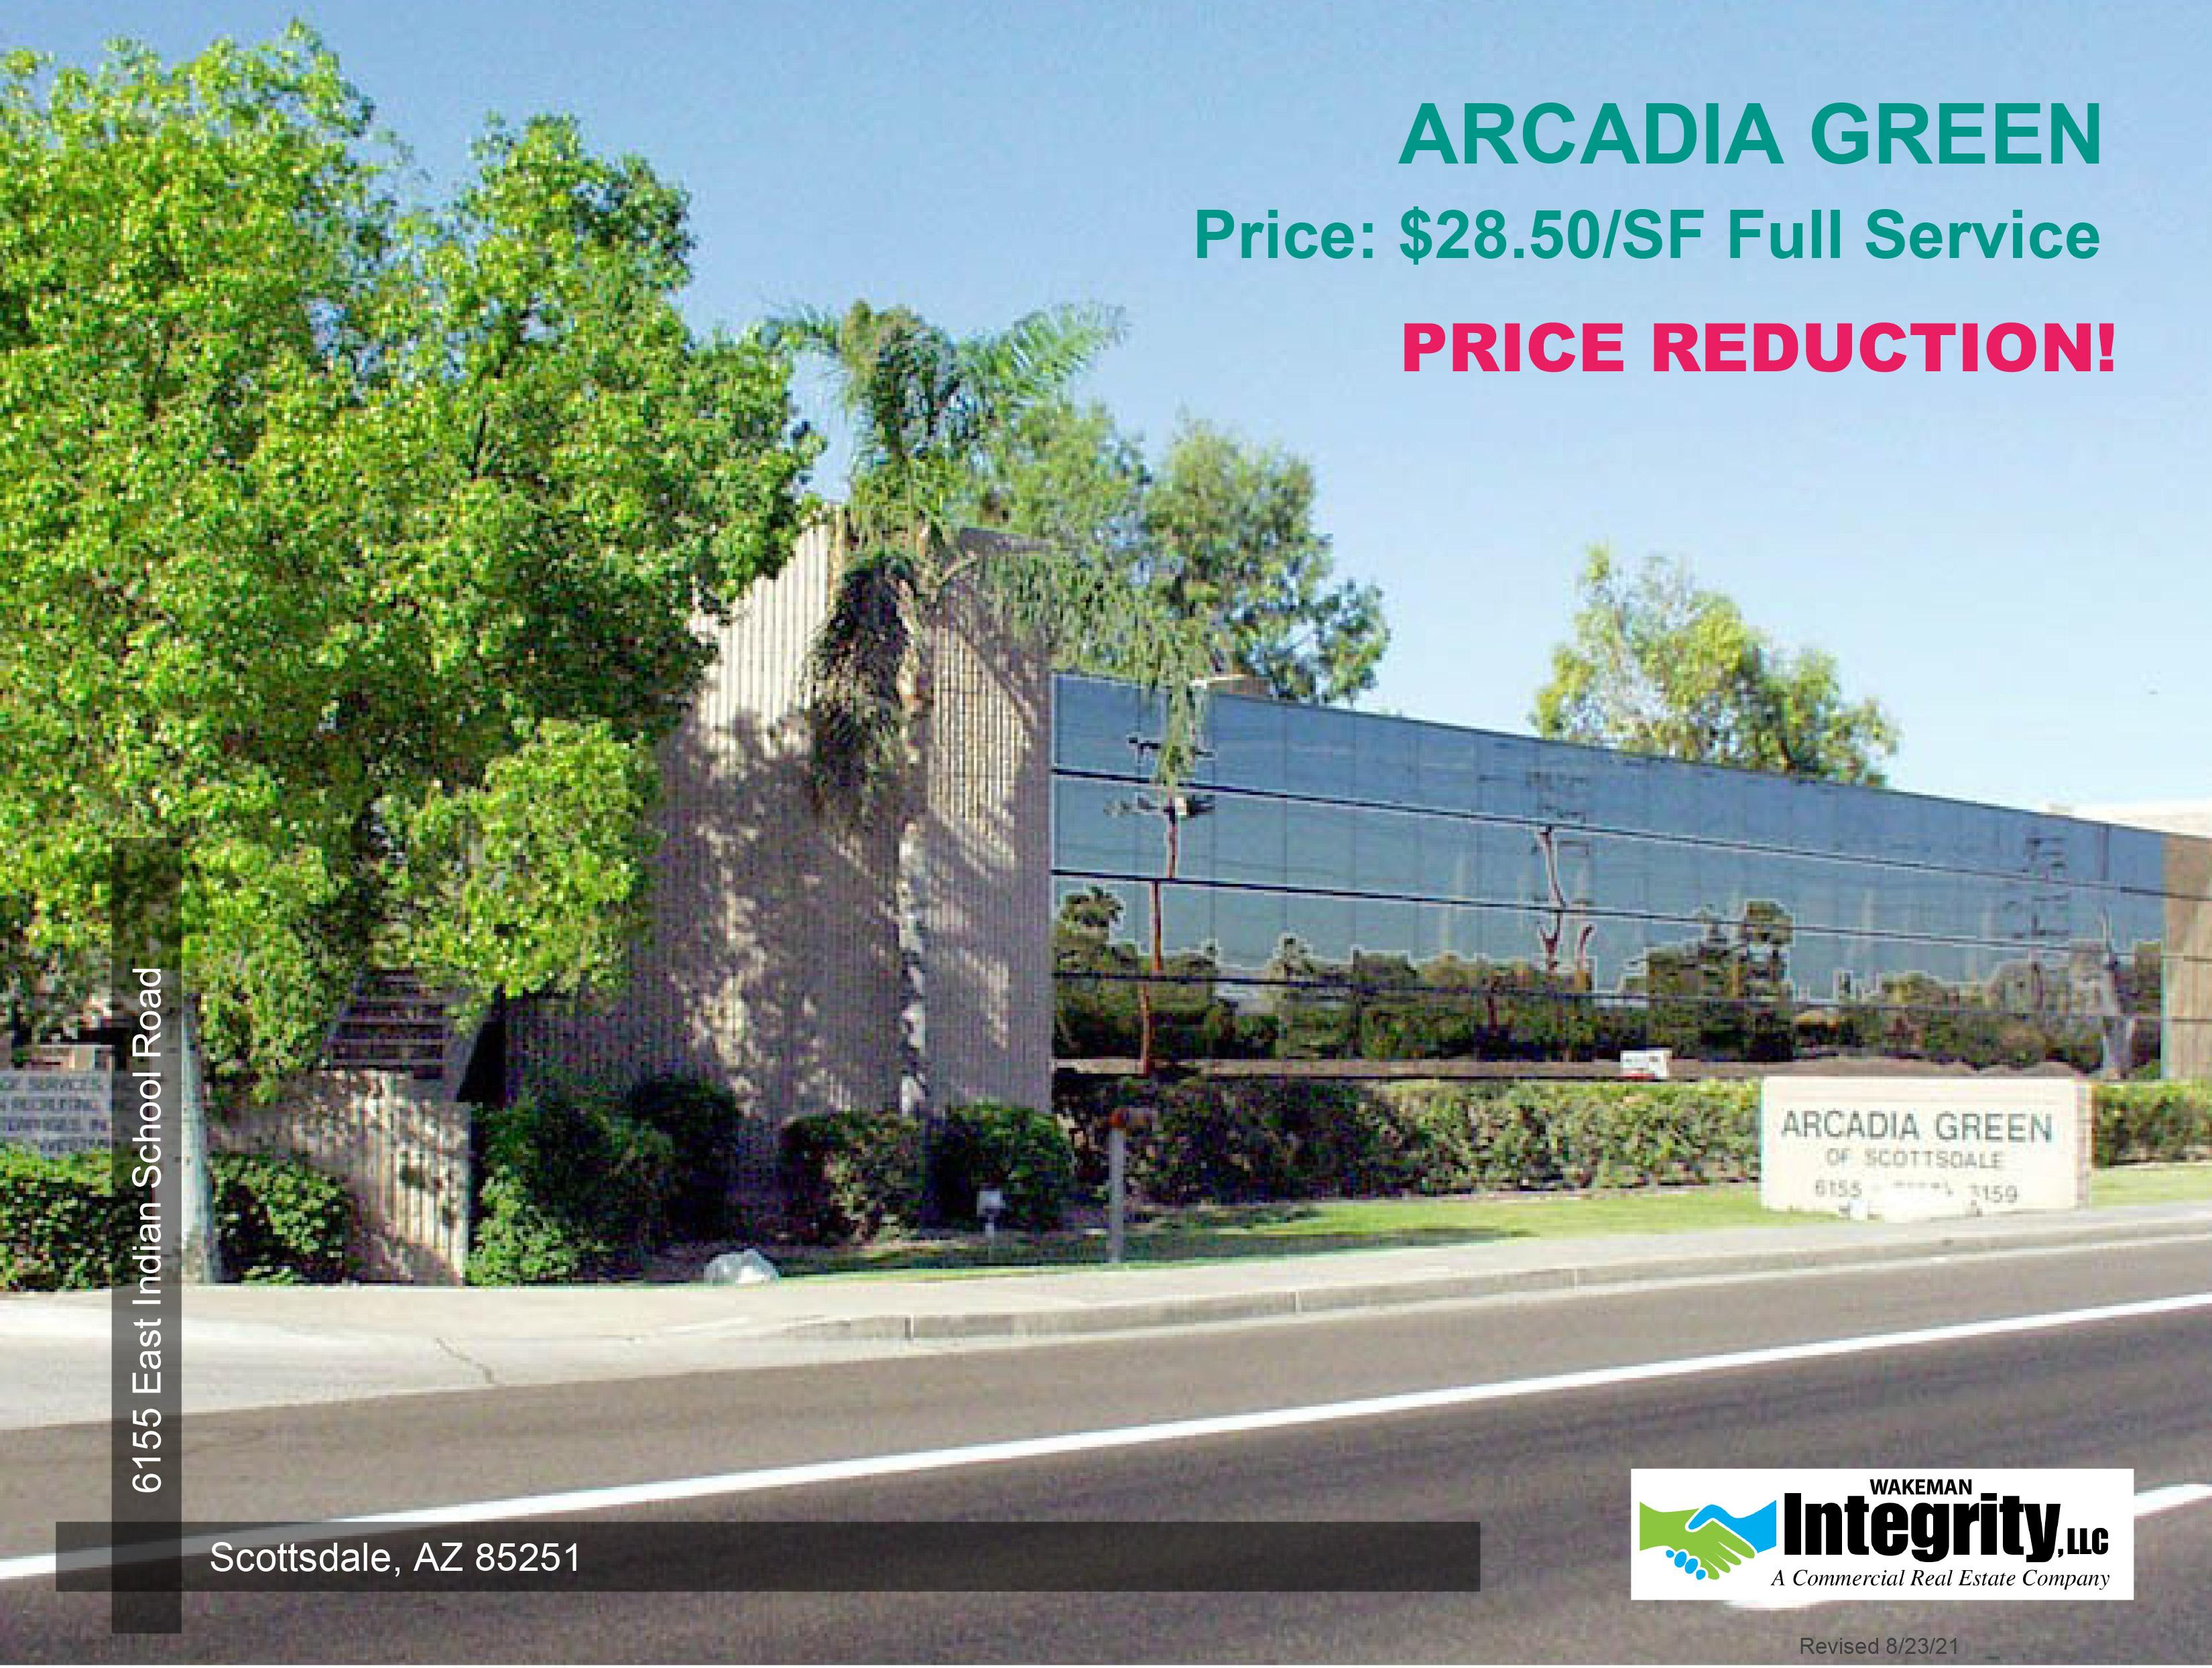 Arcadia Green